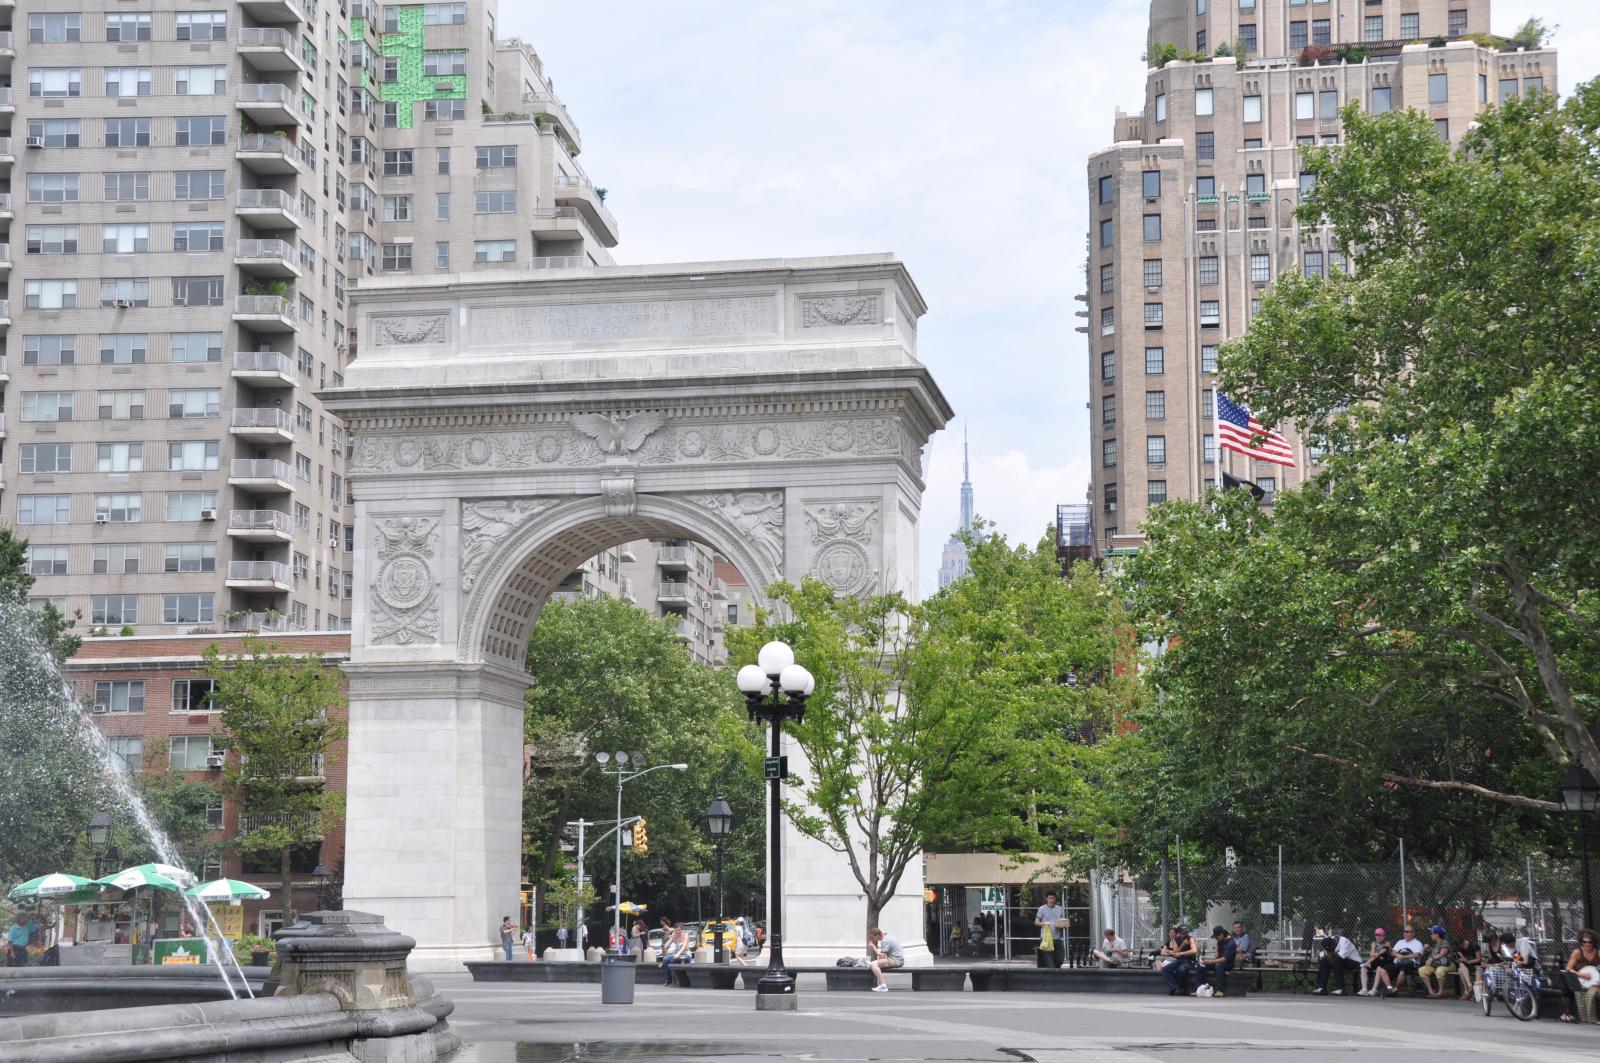 Am Washington Square Park